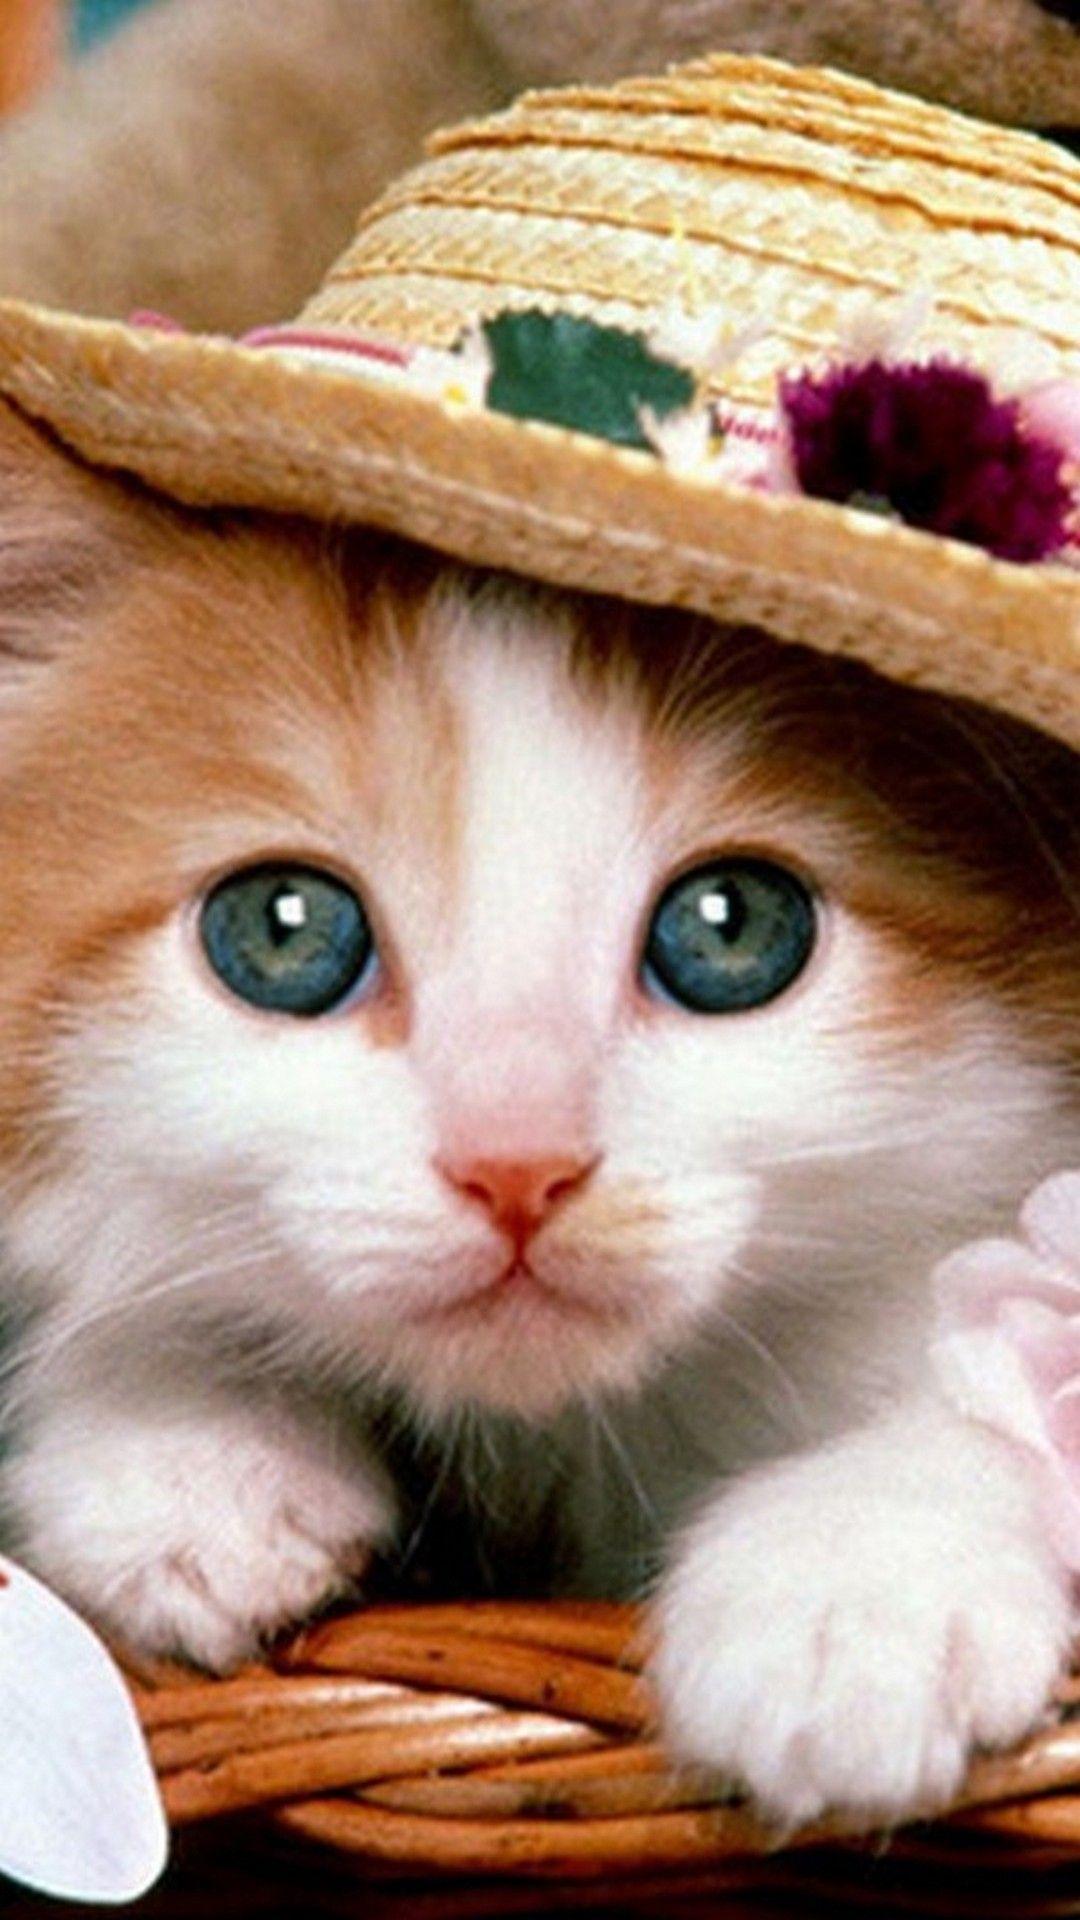 Cute Cat Hat Wallpaper For Iphone Best Iphone Wallpaper Cute Cats And Dogs Funny Cat Wallpaper Cute Cat Wallpaper